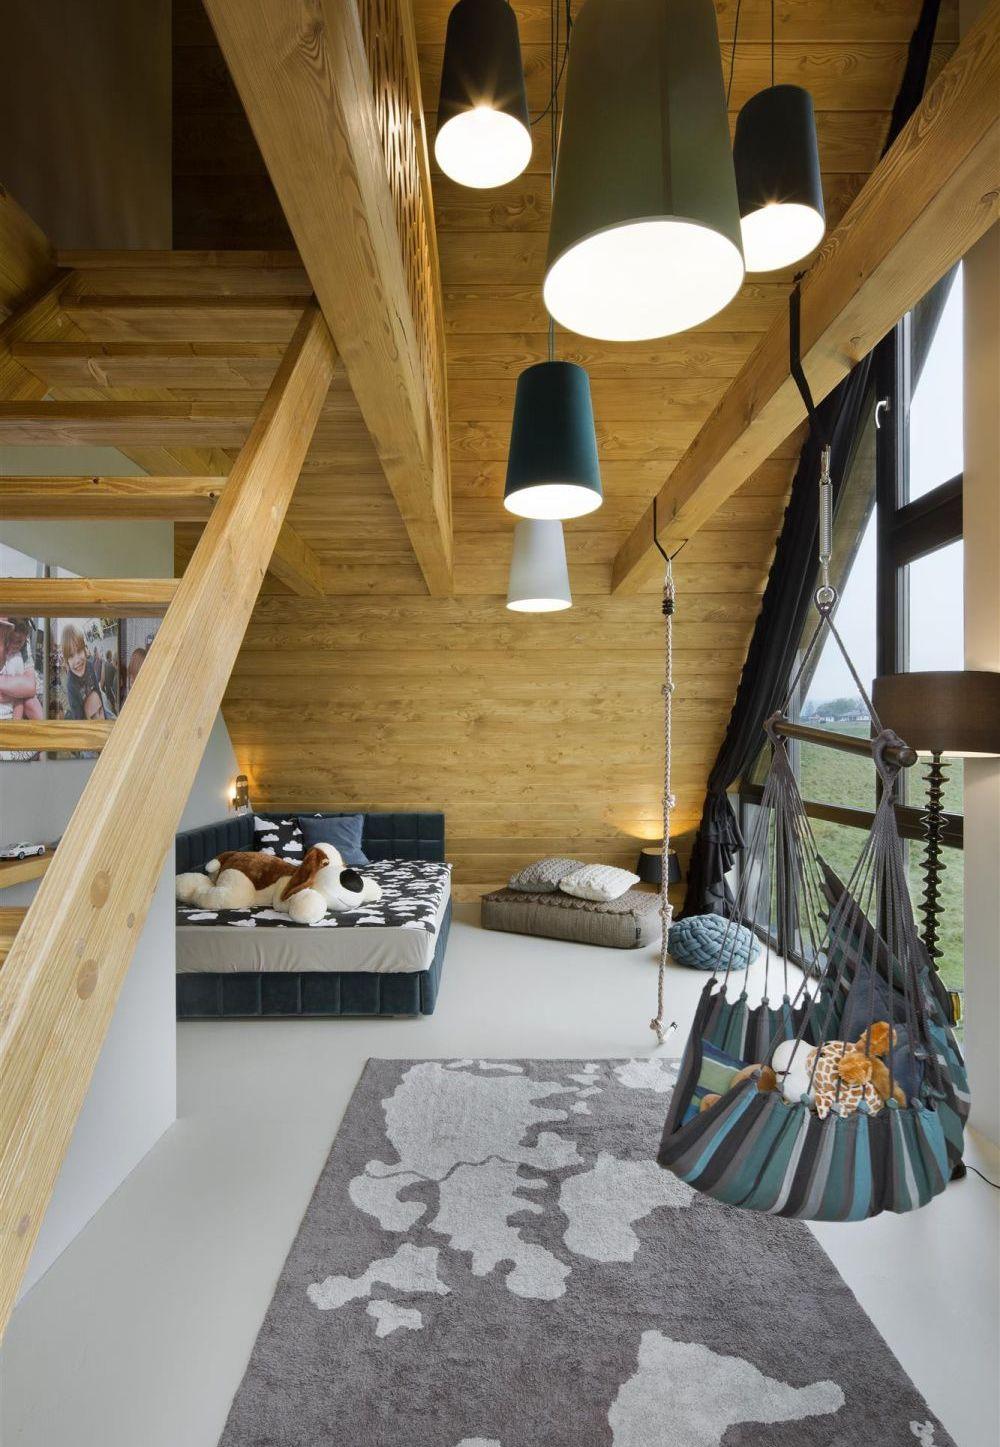 adelaparvu.com despre casa contemporana inspirata de arhitectura traditionala, Design Hola Design Studio, arhitectura Exterior, Foto Yassen Hristov (5)